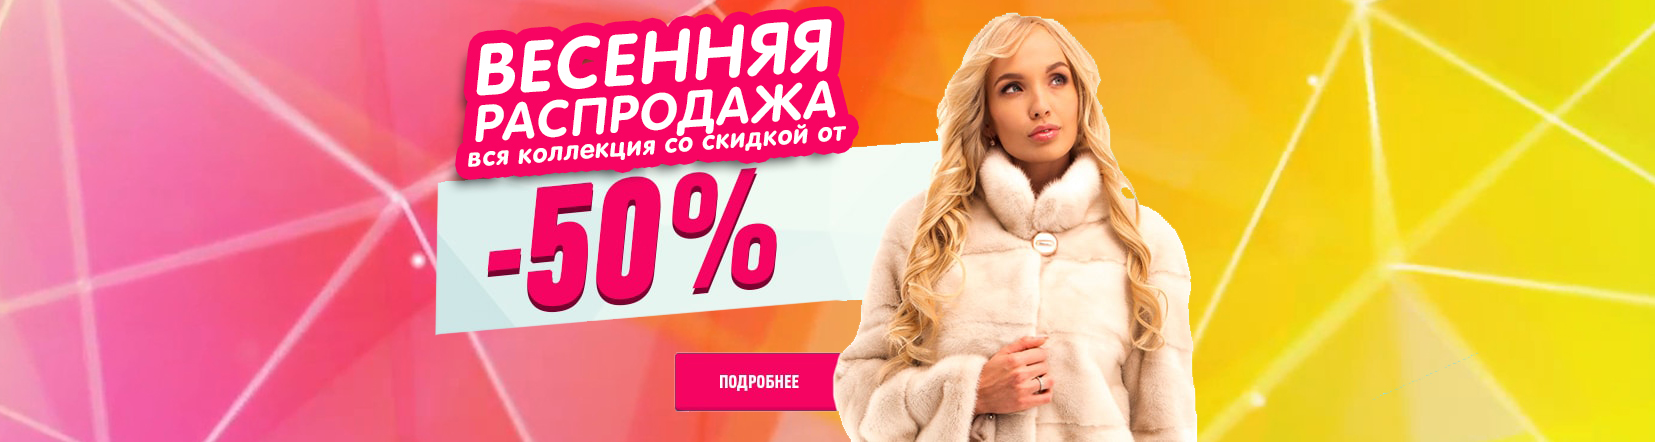 Распродажа -50%